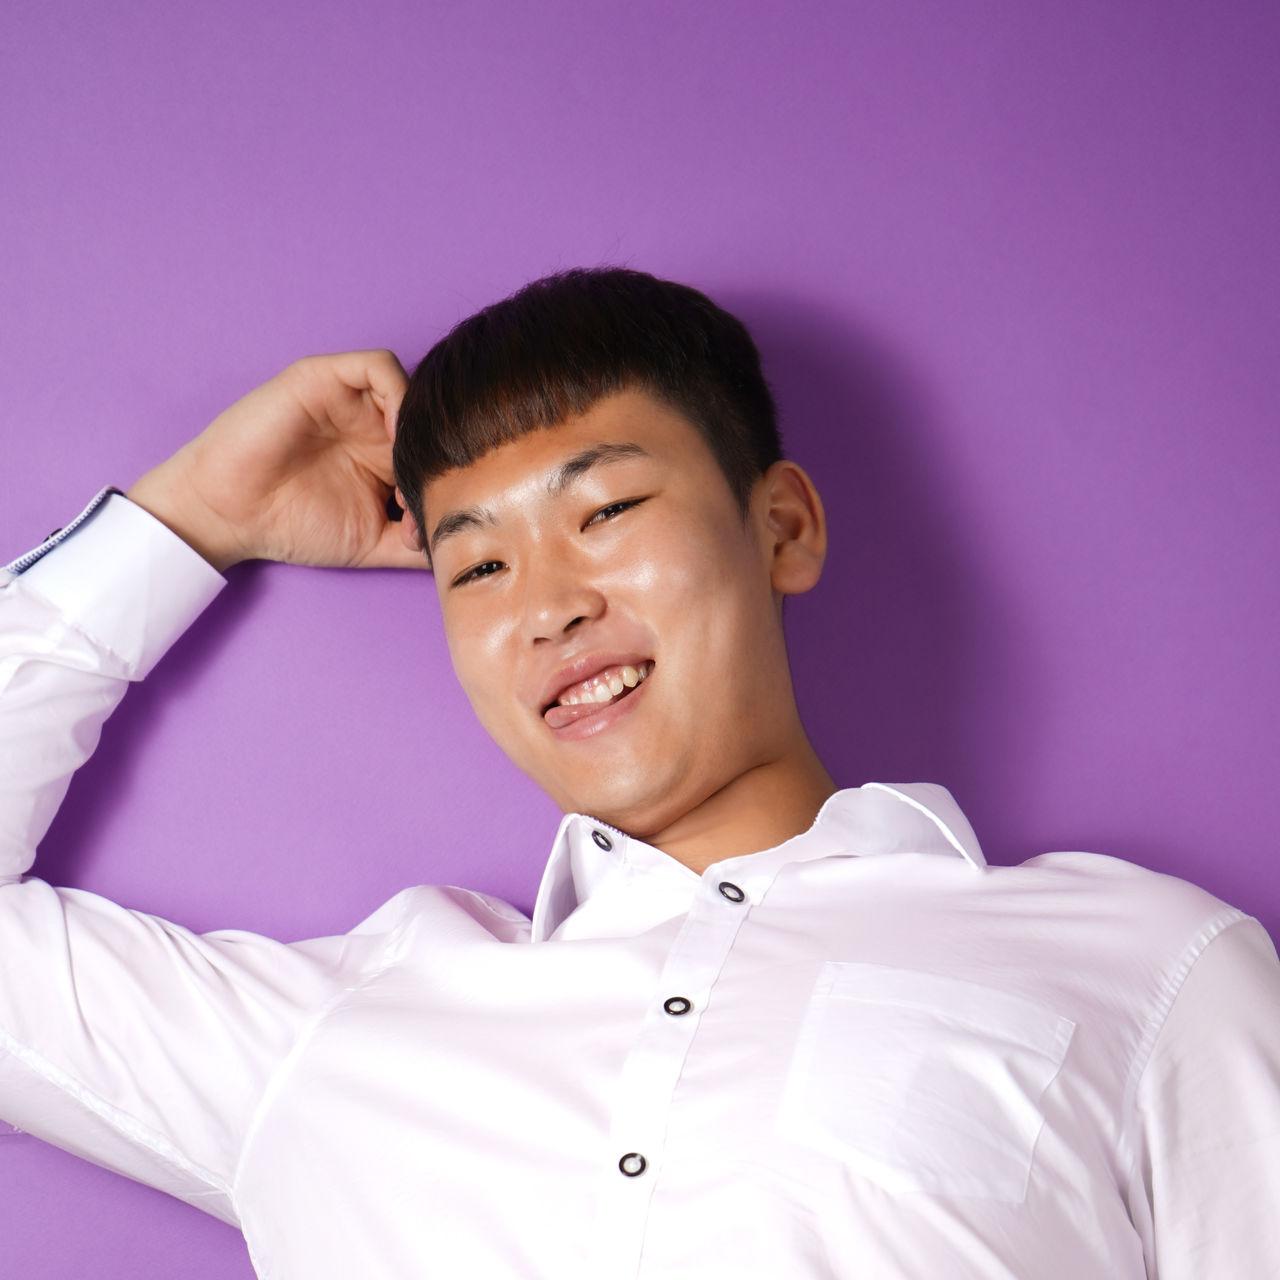 <b>JungJiHun</b><br>Lead Fundraiser<br>